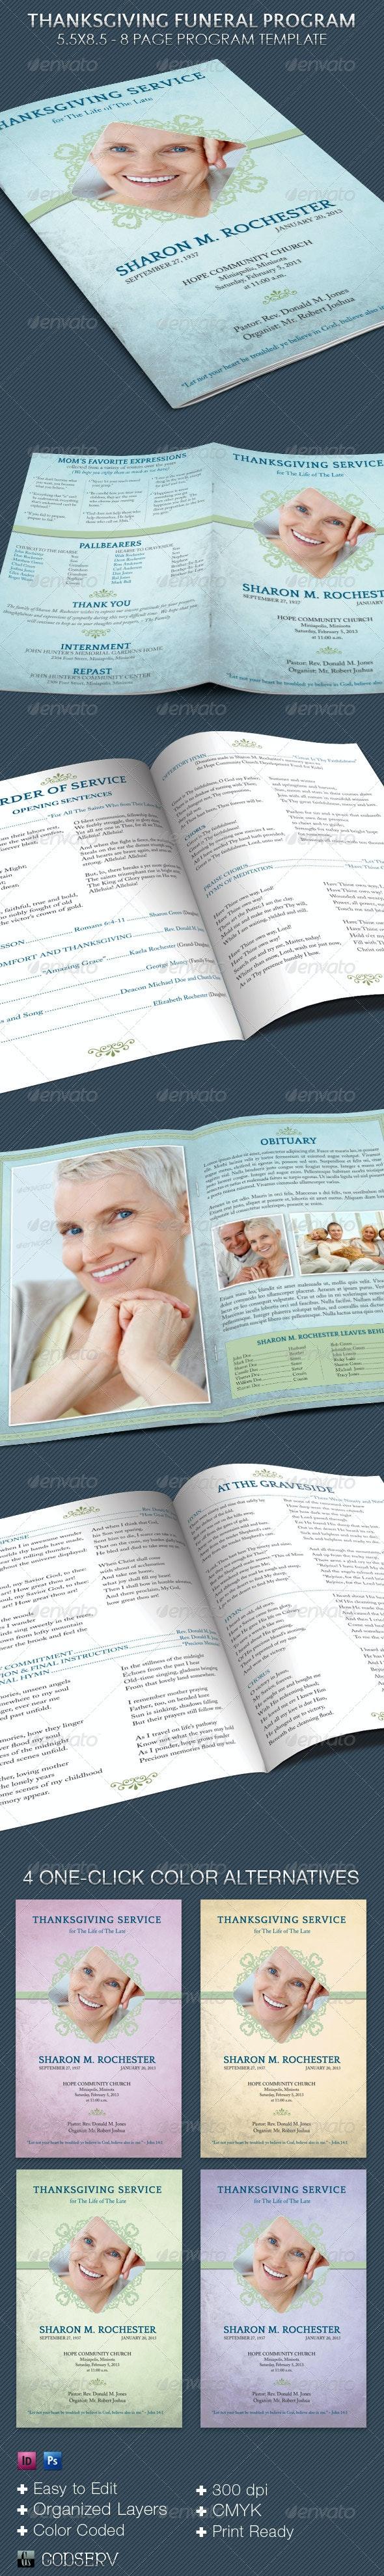 Thanksgiving Funeral Program Template - Informational Brochures